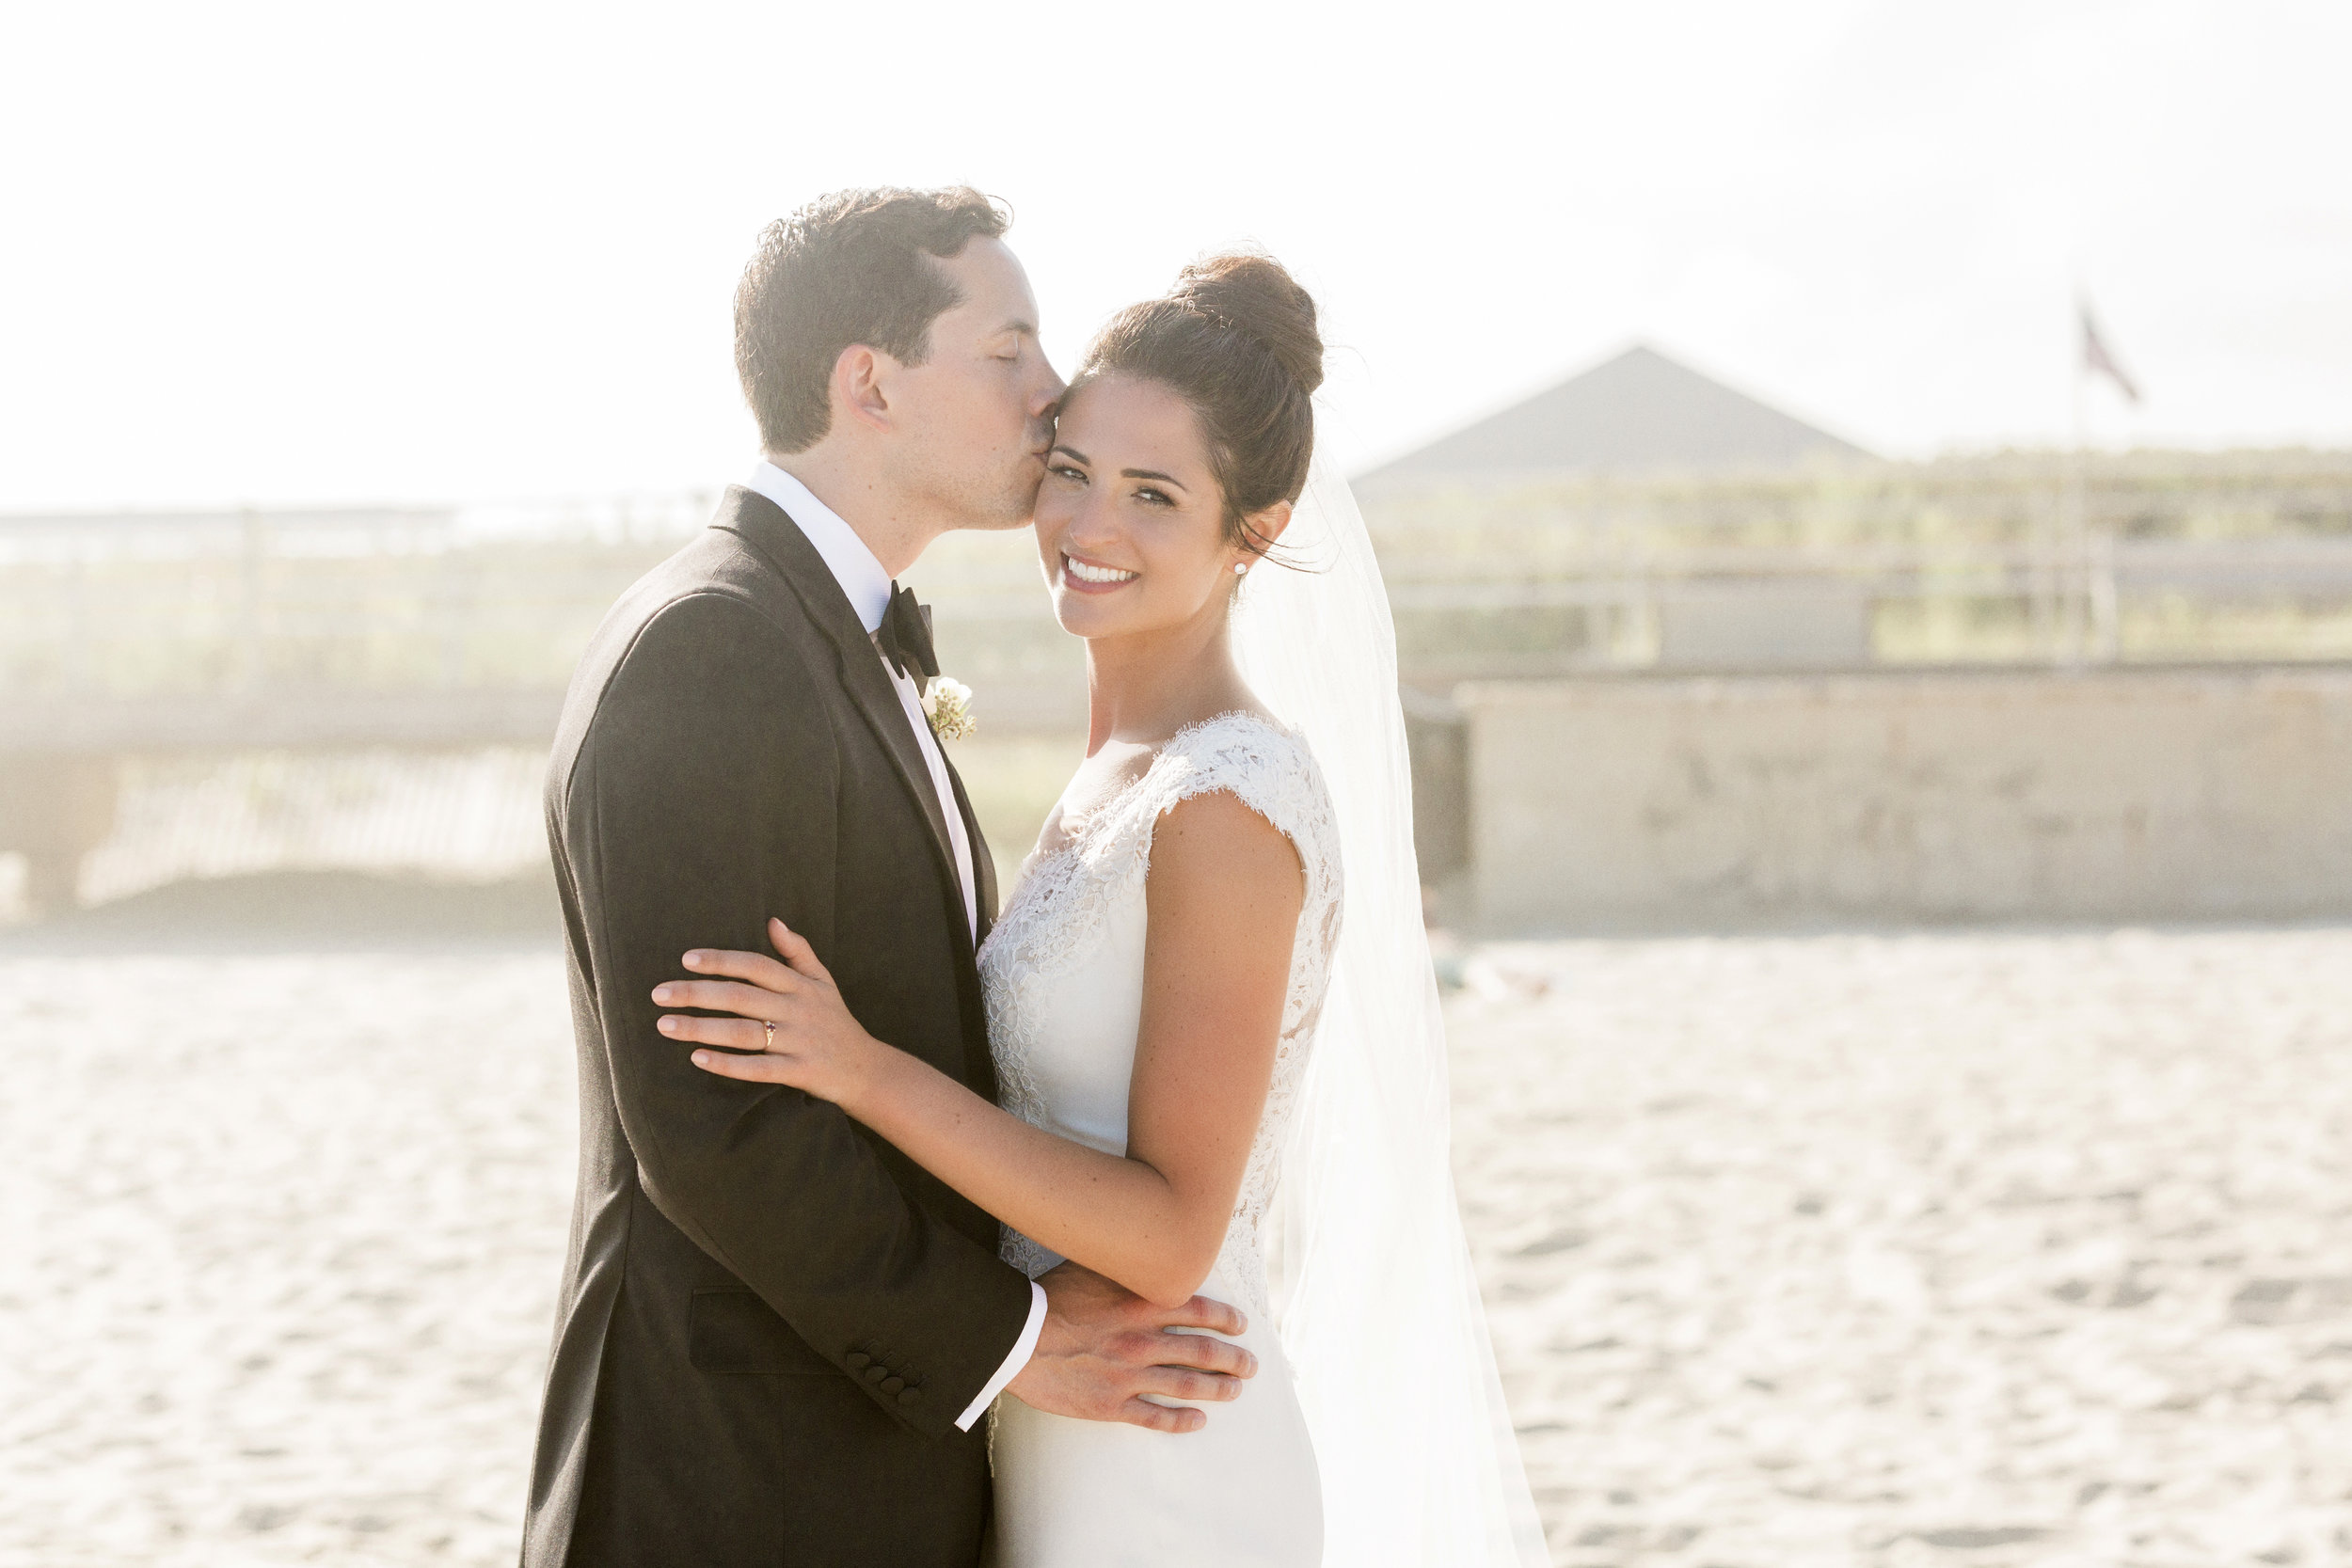 Spring-Lake-New-Jersey-Beach-Wedding-Photographer_201.jpg